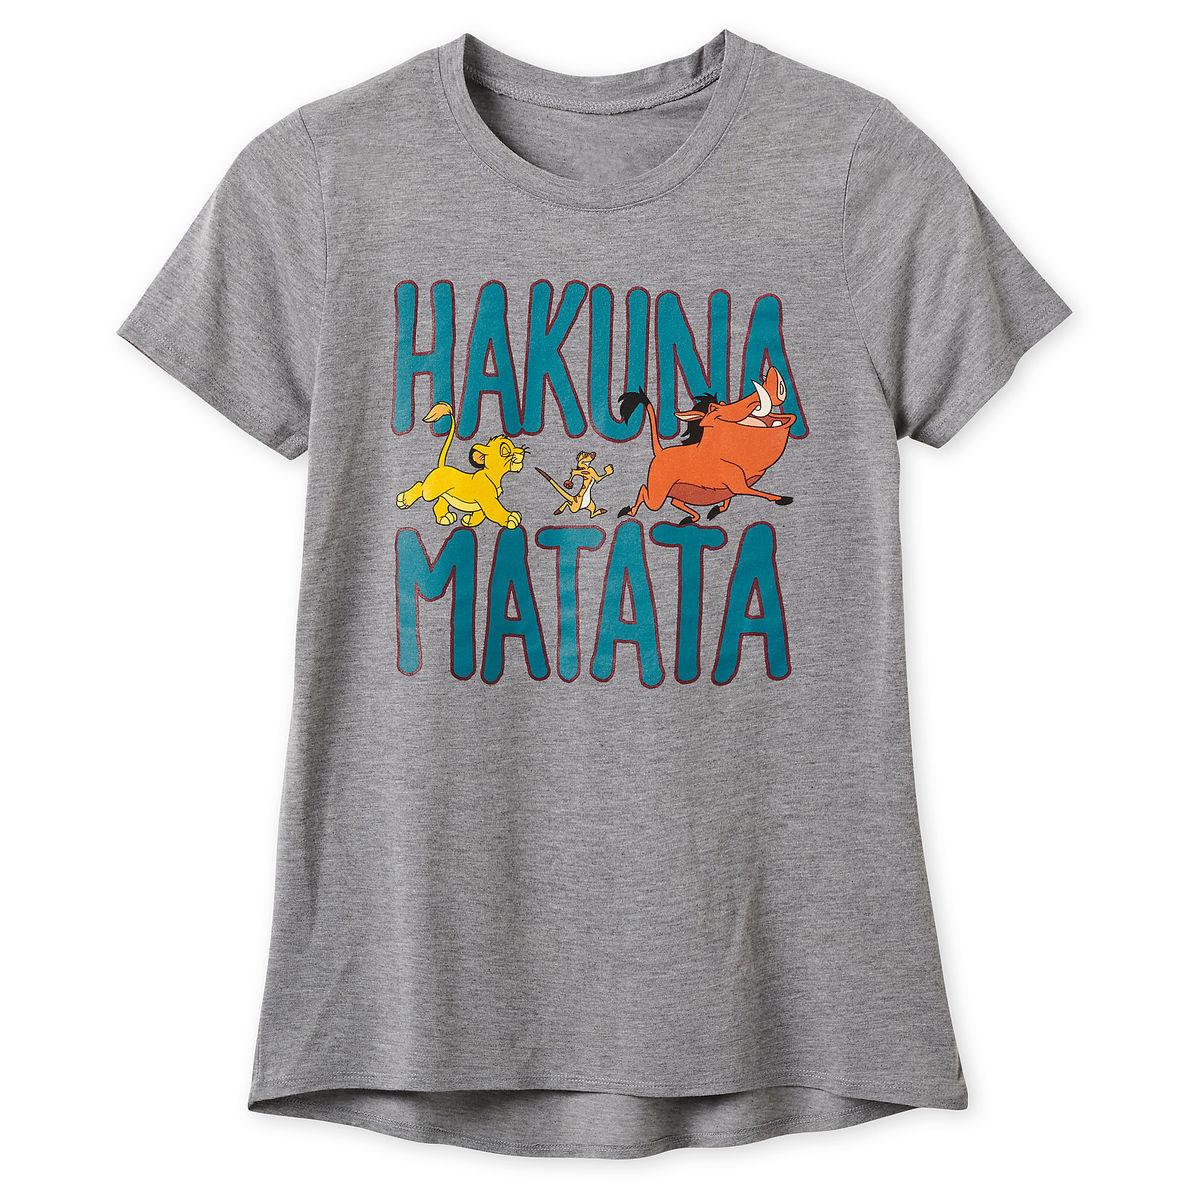 500b0b34 Disney T-Shirt for Women - Lion King - Hakuna Matata - Gray